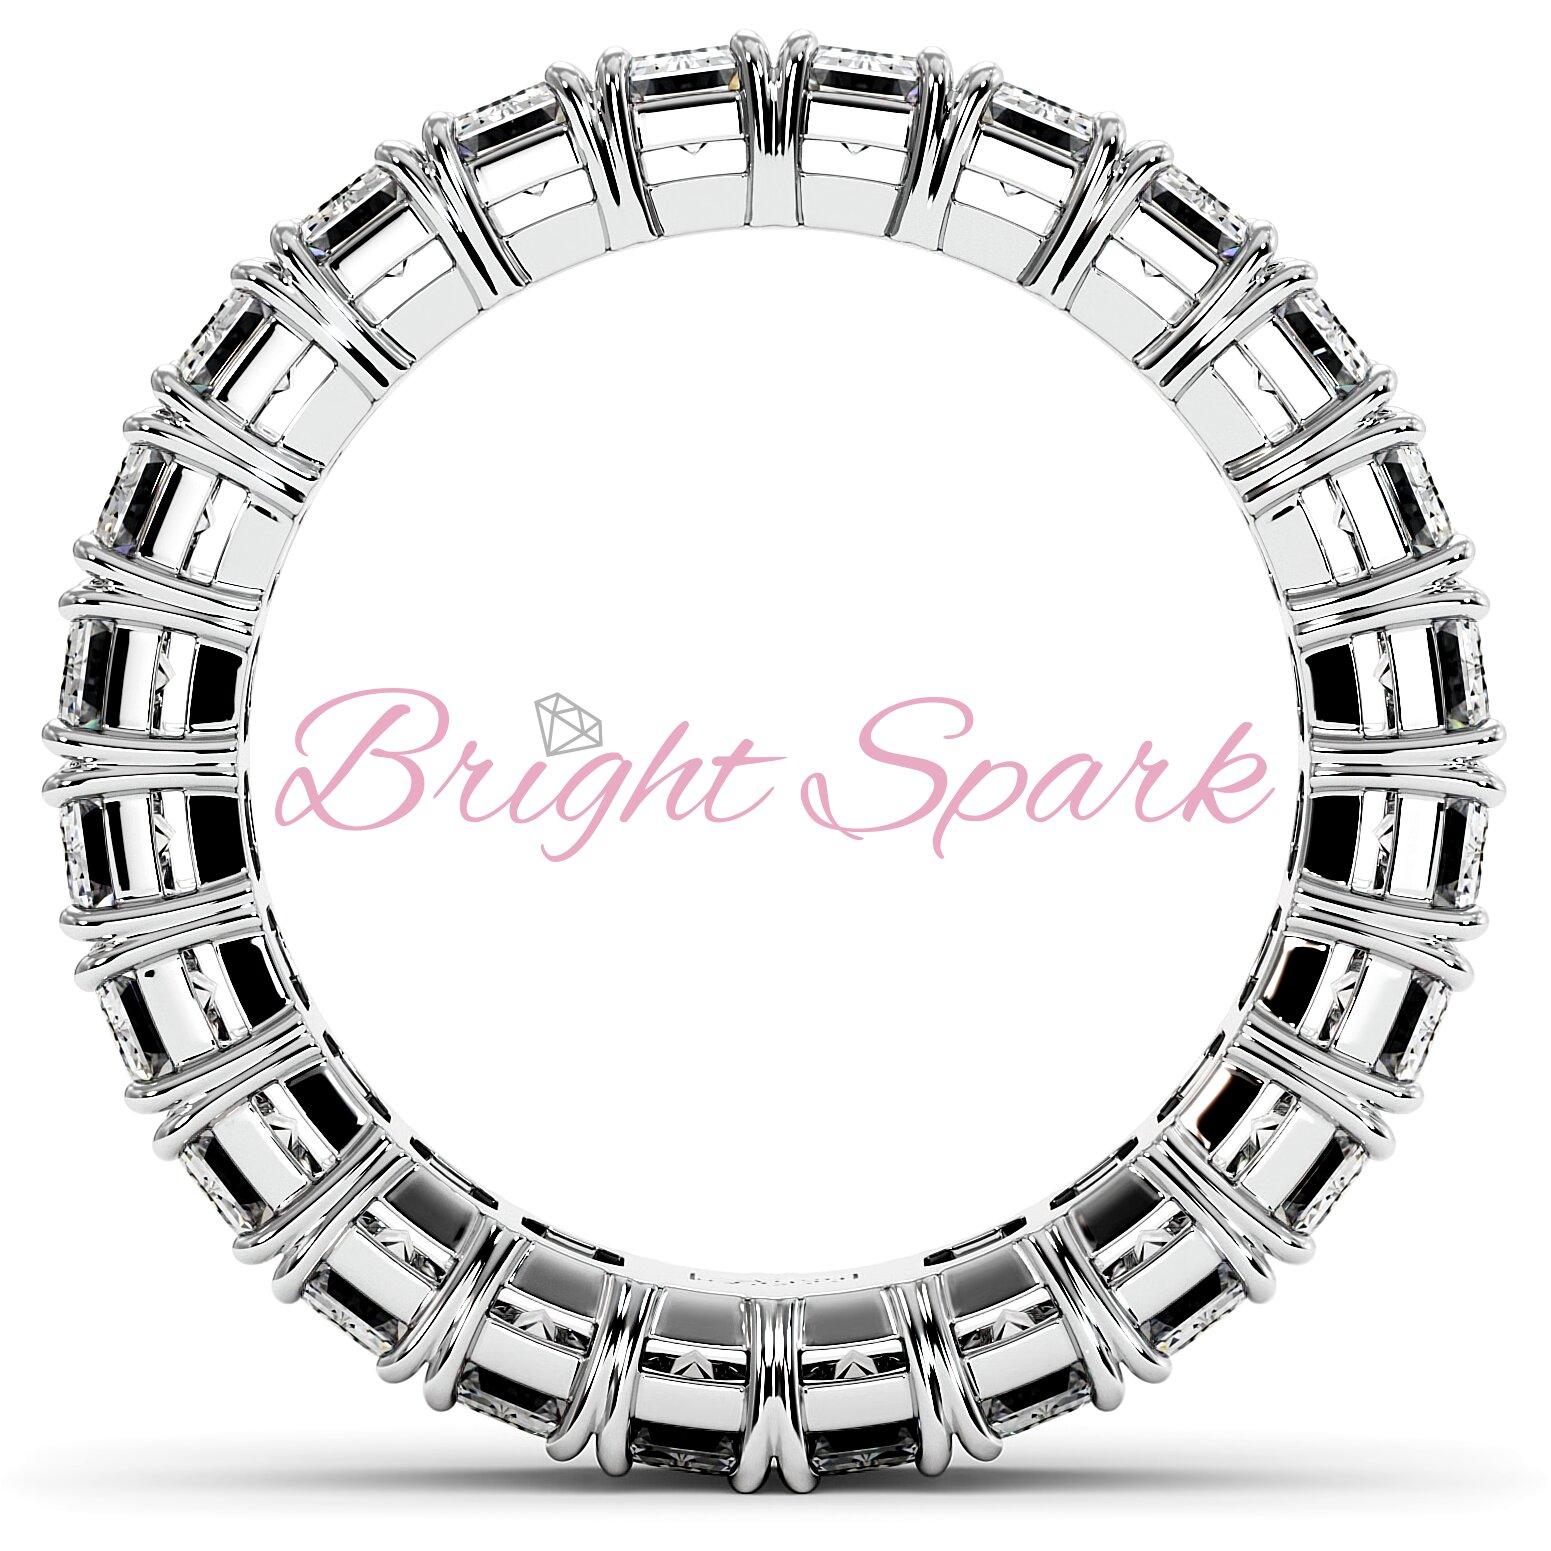 Кольцо с бриллиантами изумрудной огранки белое золото 3,6 карата